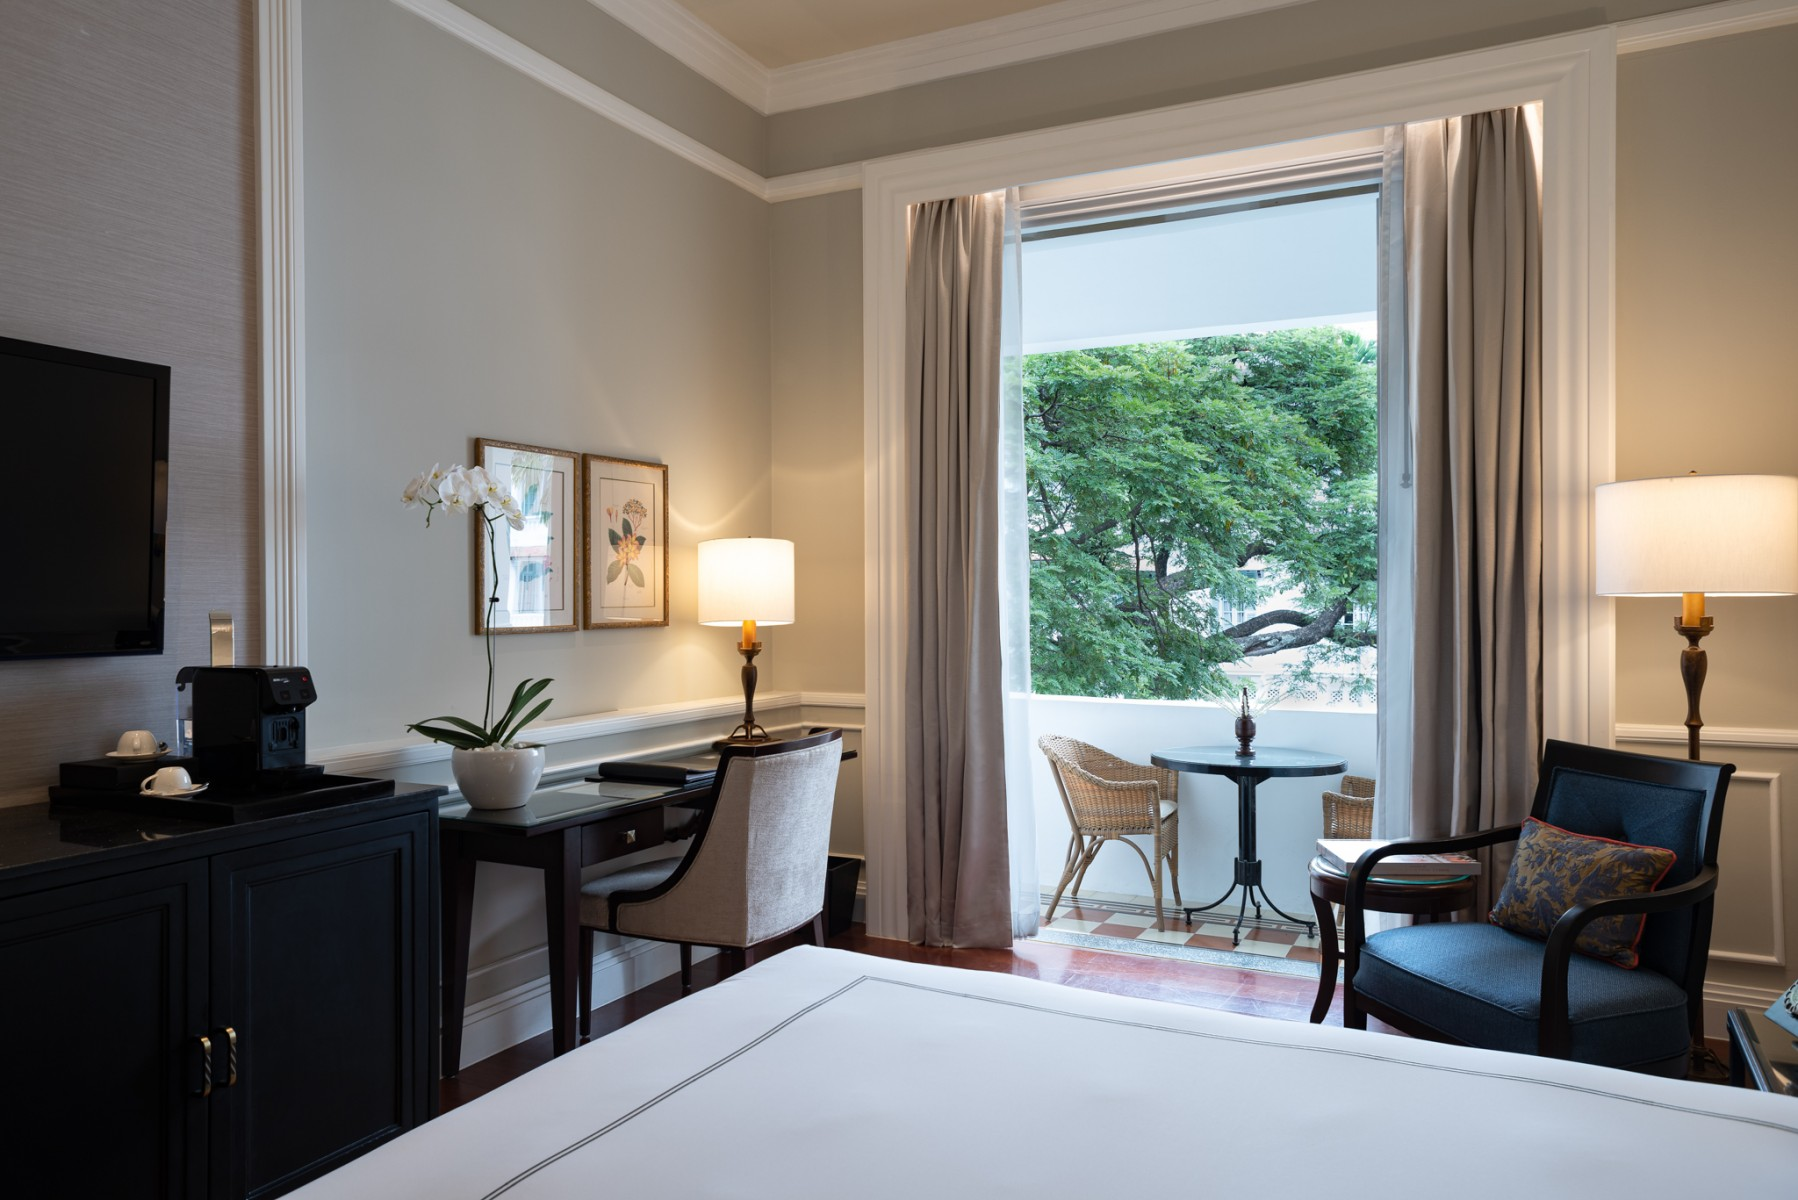 Raffles Hotel Le Royal Phnom Penh - Gallery